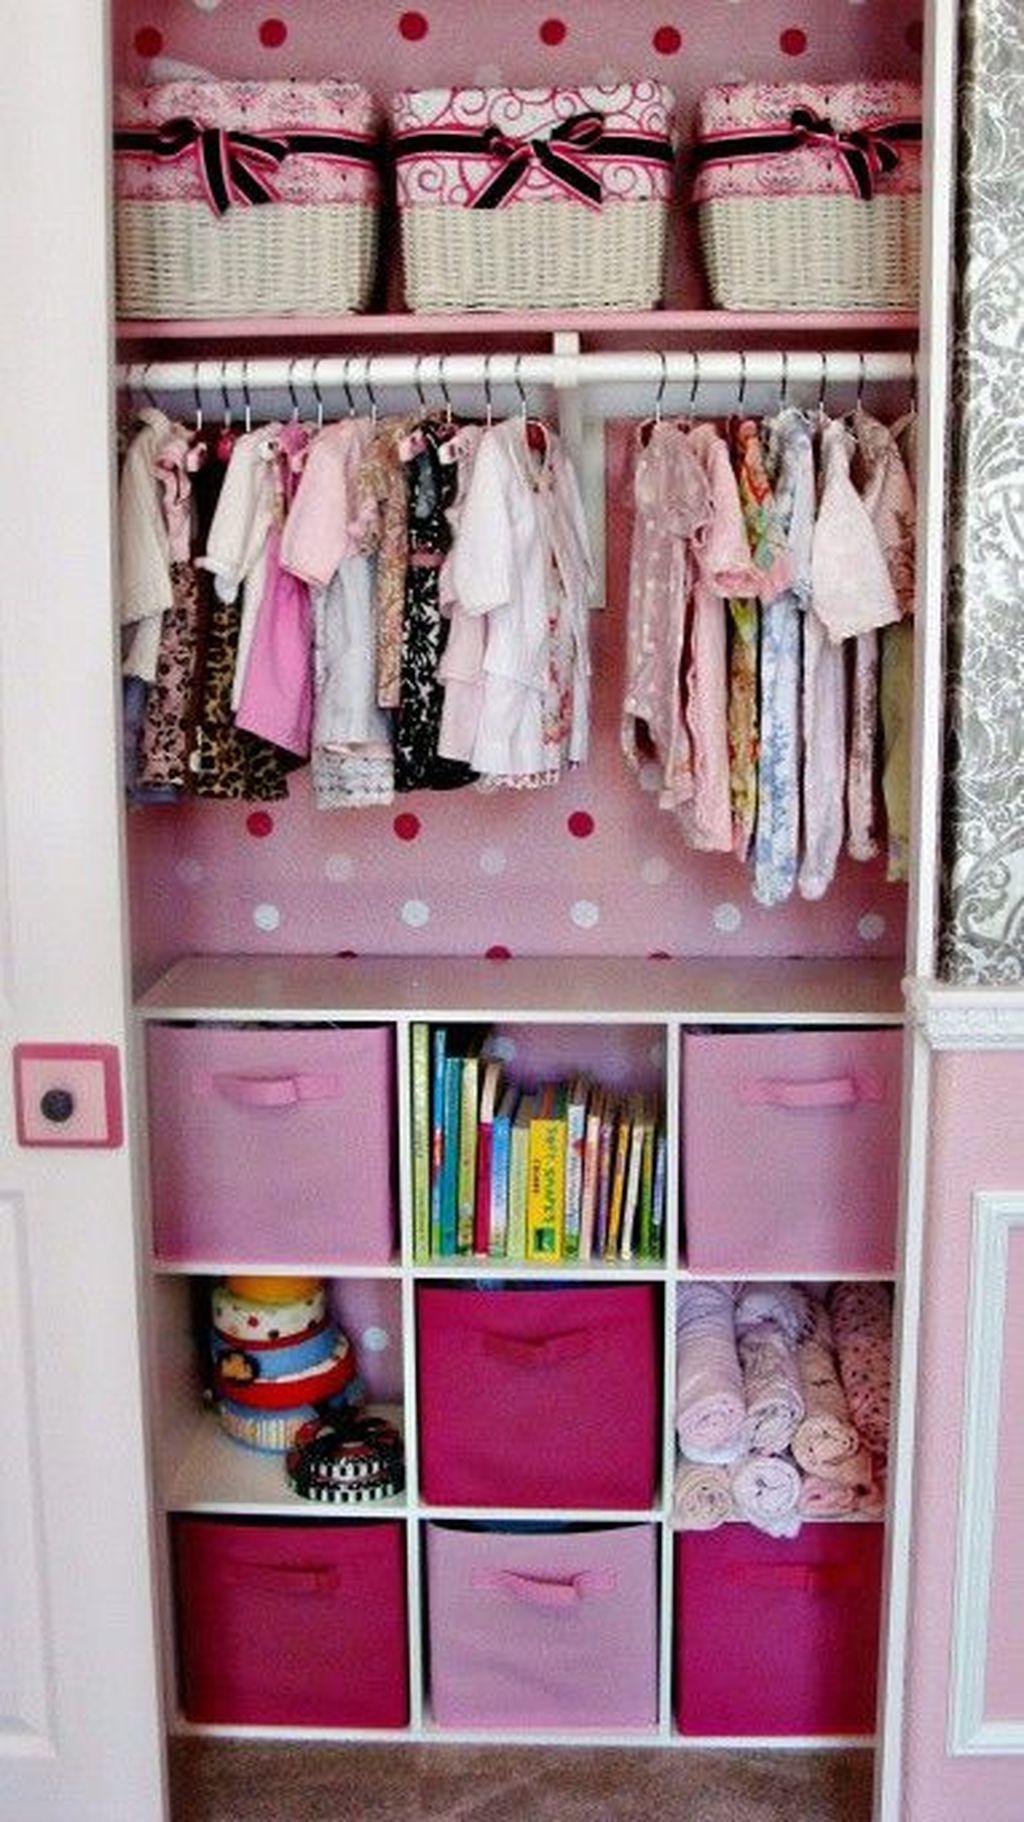 32+ Amazing Closet Organization Ideas (The Secrets of an Organized Room) images